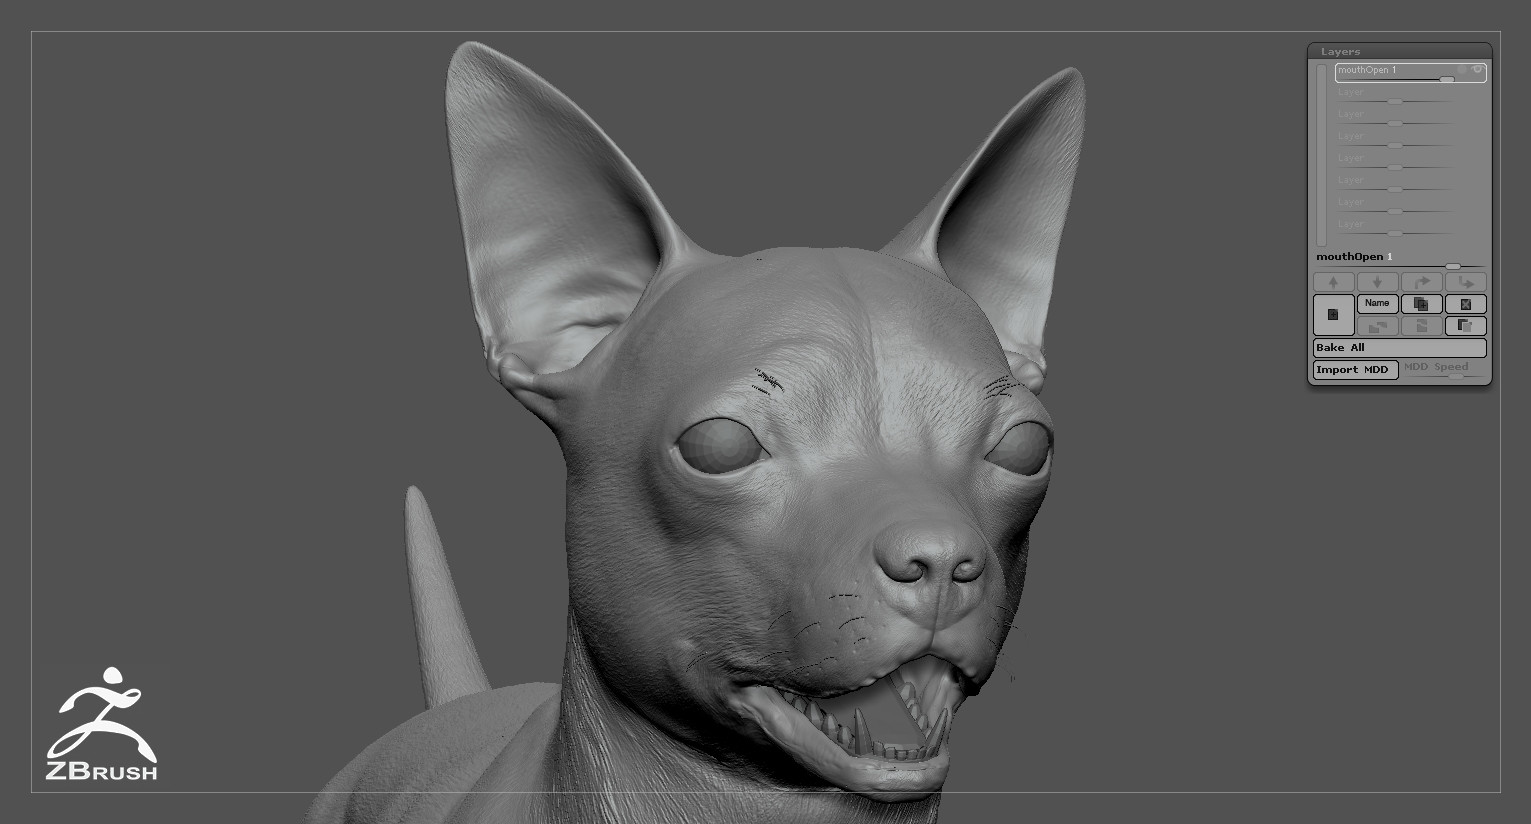 Chihuahua by alexlashko zbrush 07